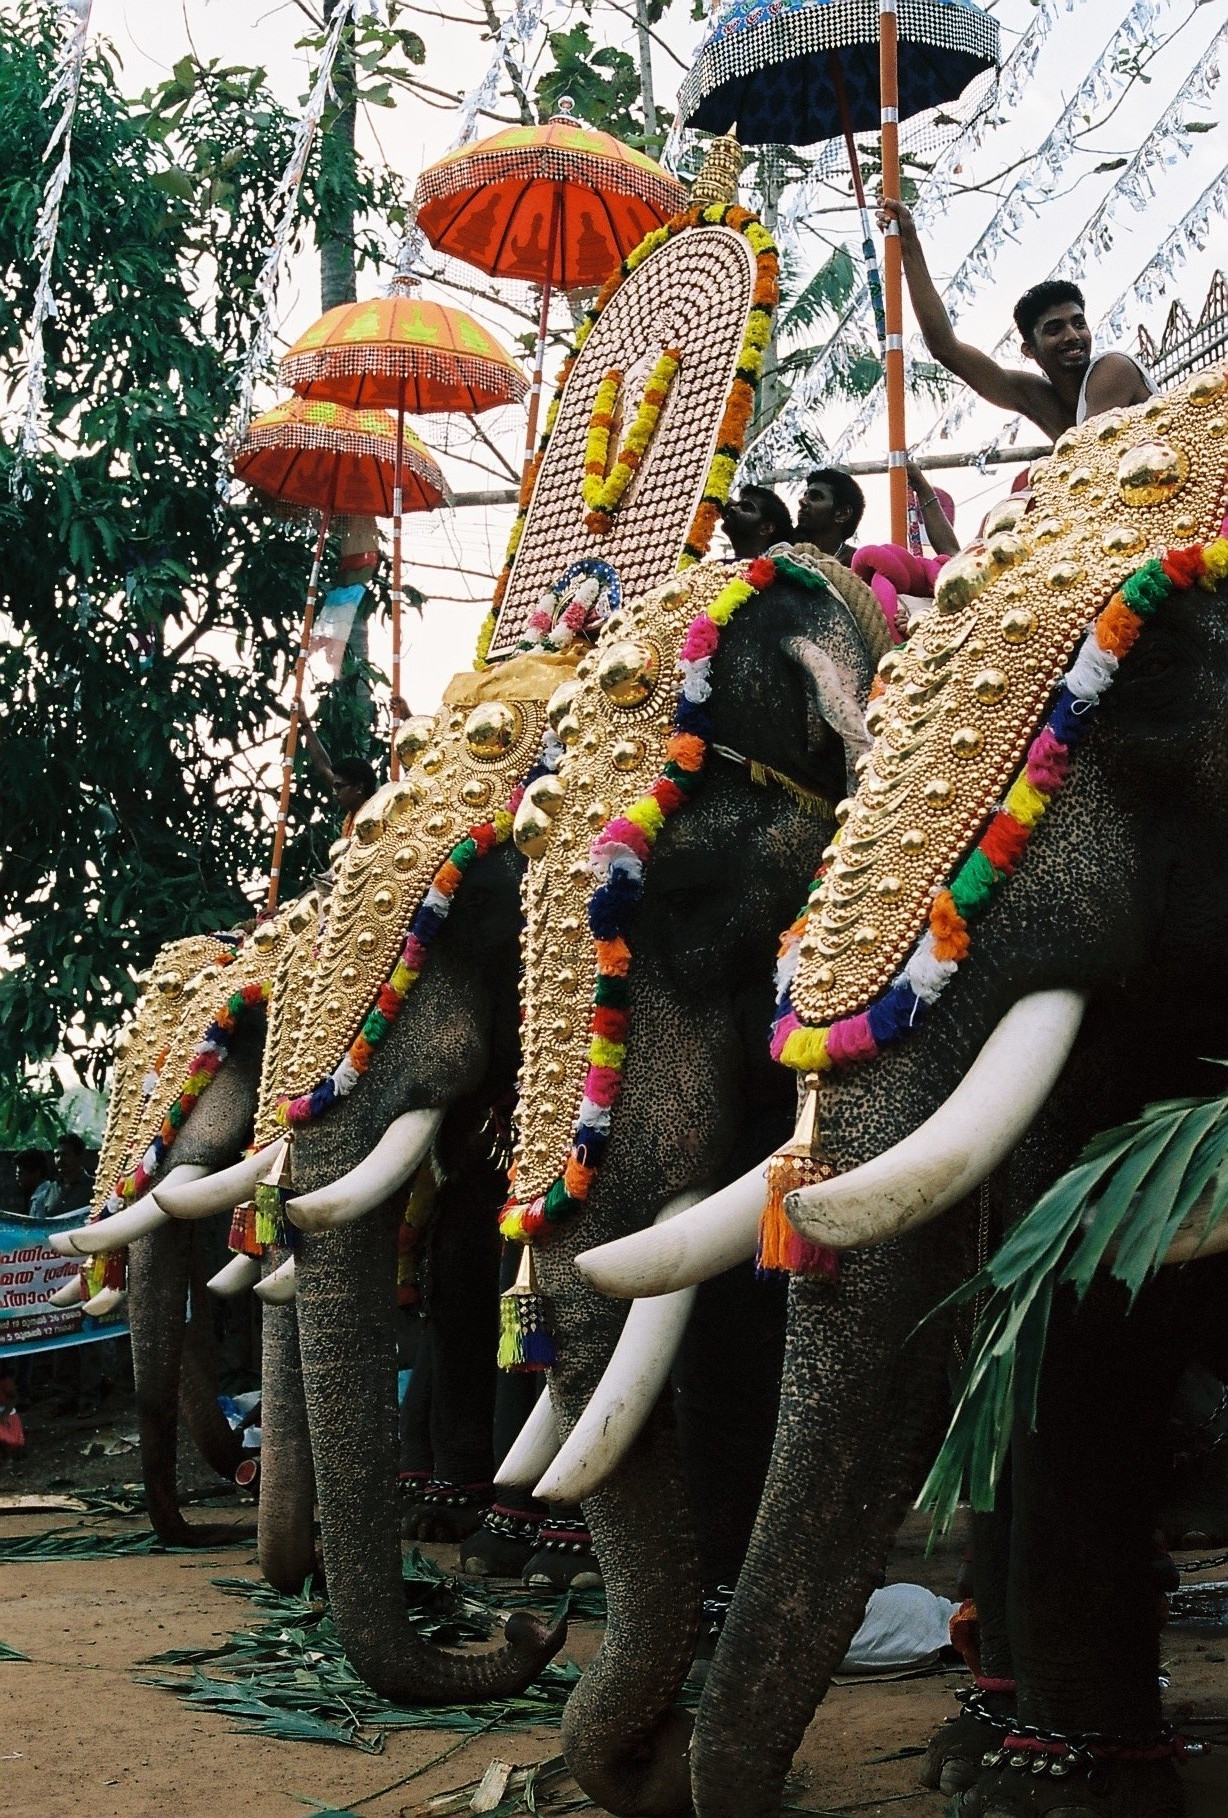 Temple festival. India